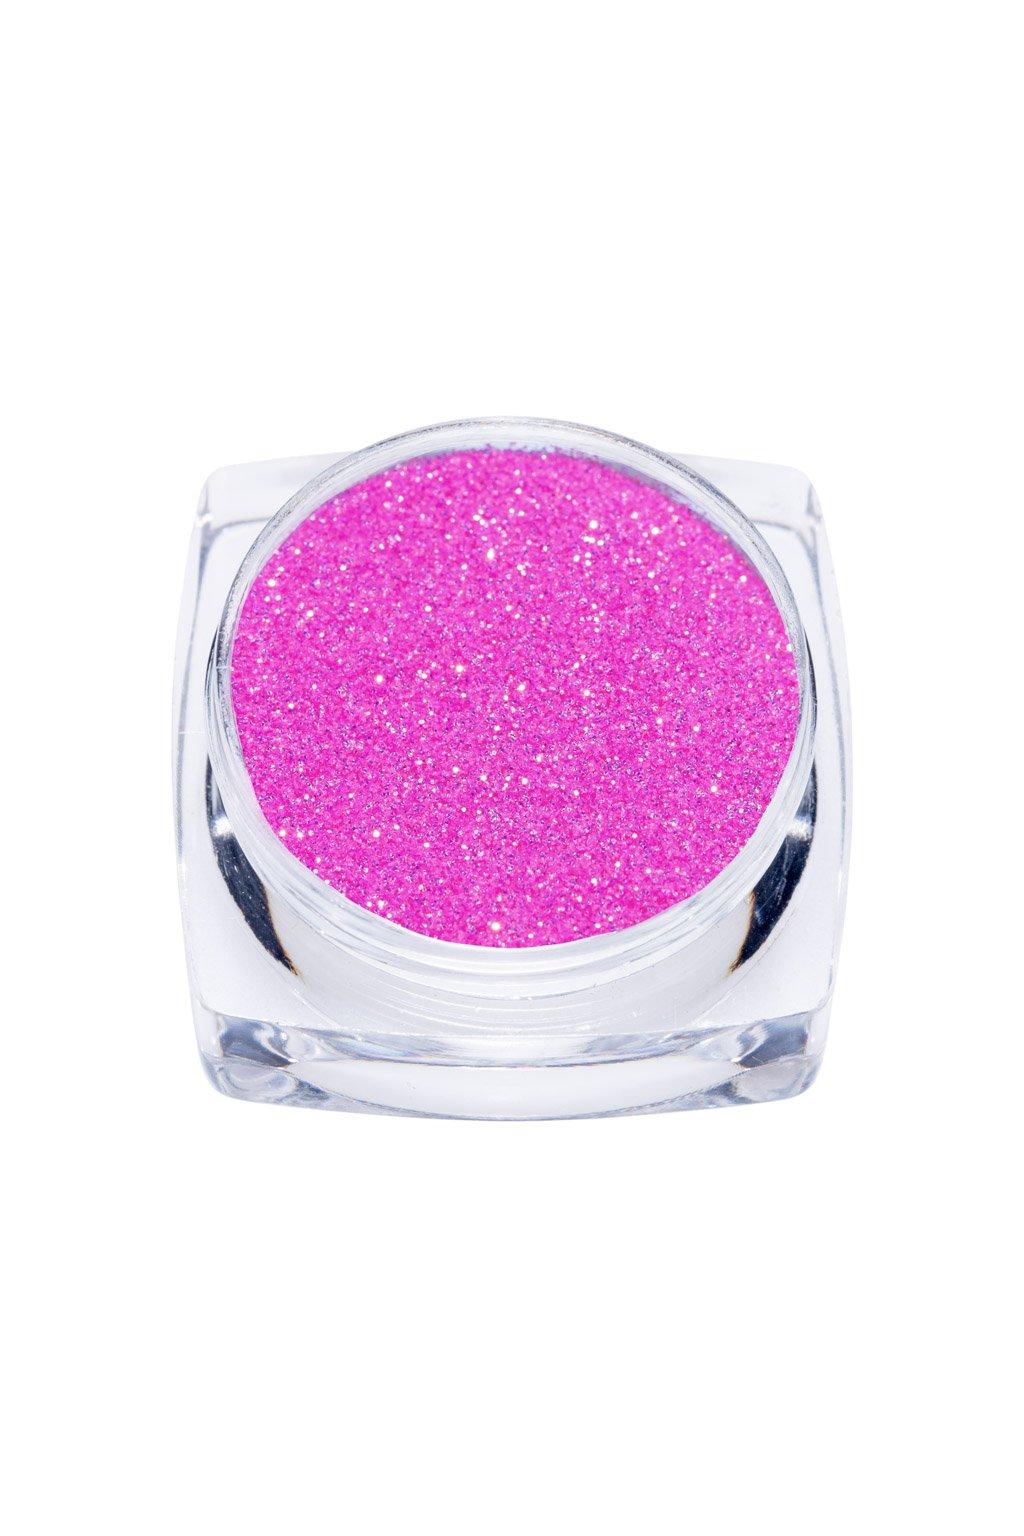 23729 magic glitter pink